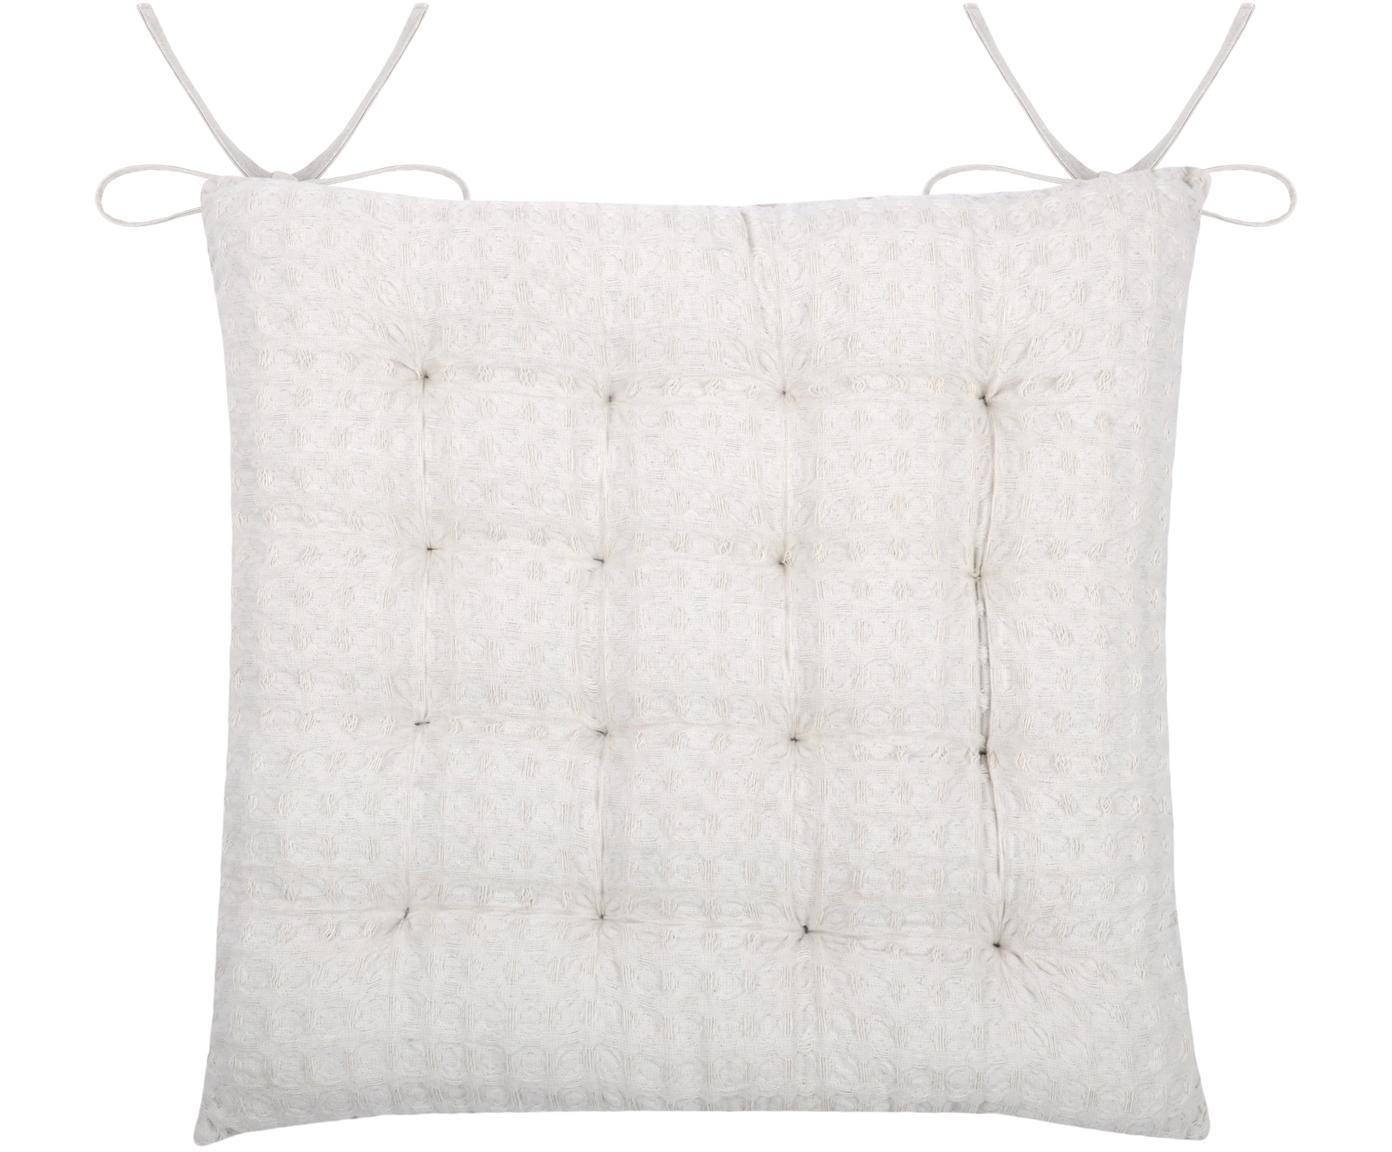 Cuscino sedia a nido d'ape Gopher, Rivestimento: cotone, Bianco, Larg. 40 x Lung. 40 cm